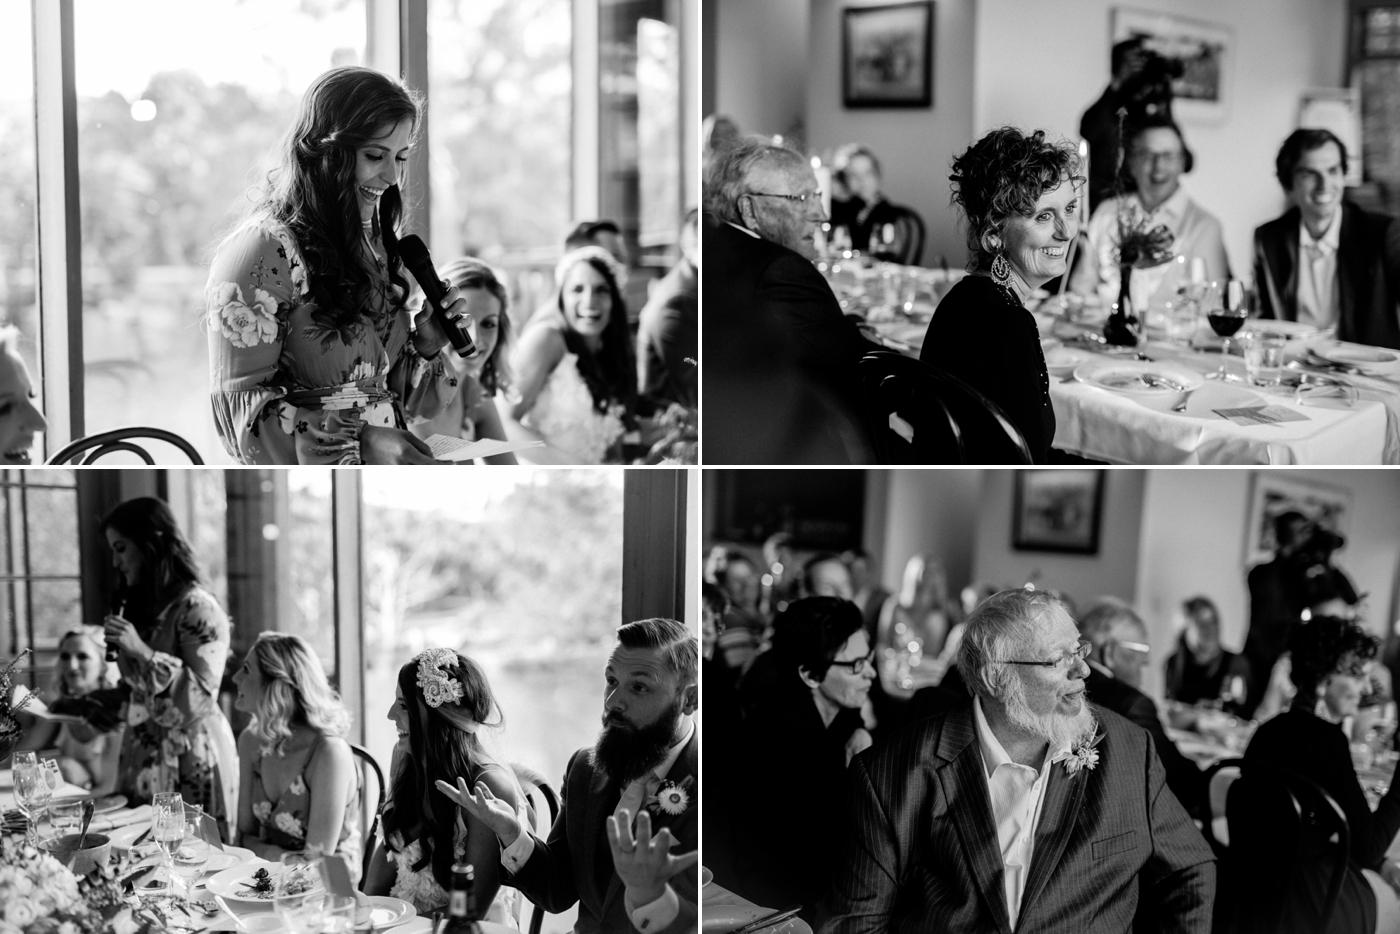 Maddy & Wes - K1 by Geoff Hardy Wedding - Adelaide Wedding Photographer - Natural wedding photography in Adelaide - Katherine Schultz_0056.jpg